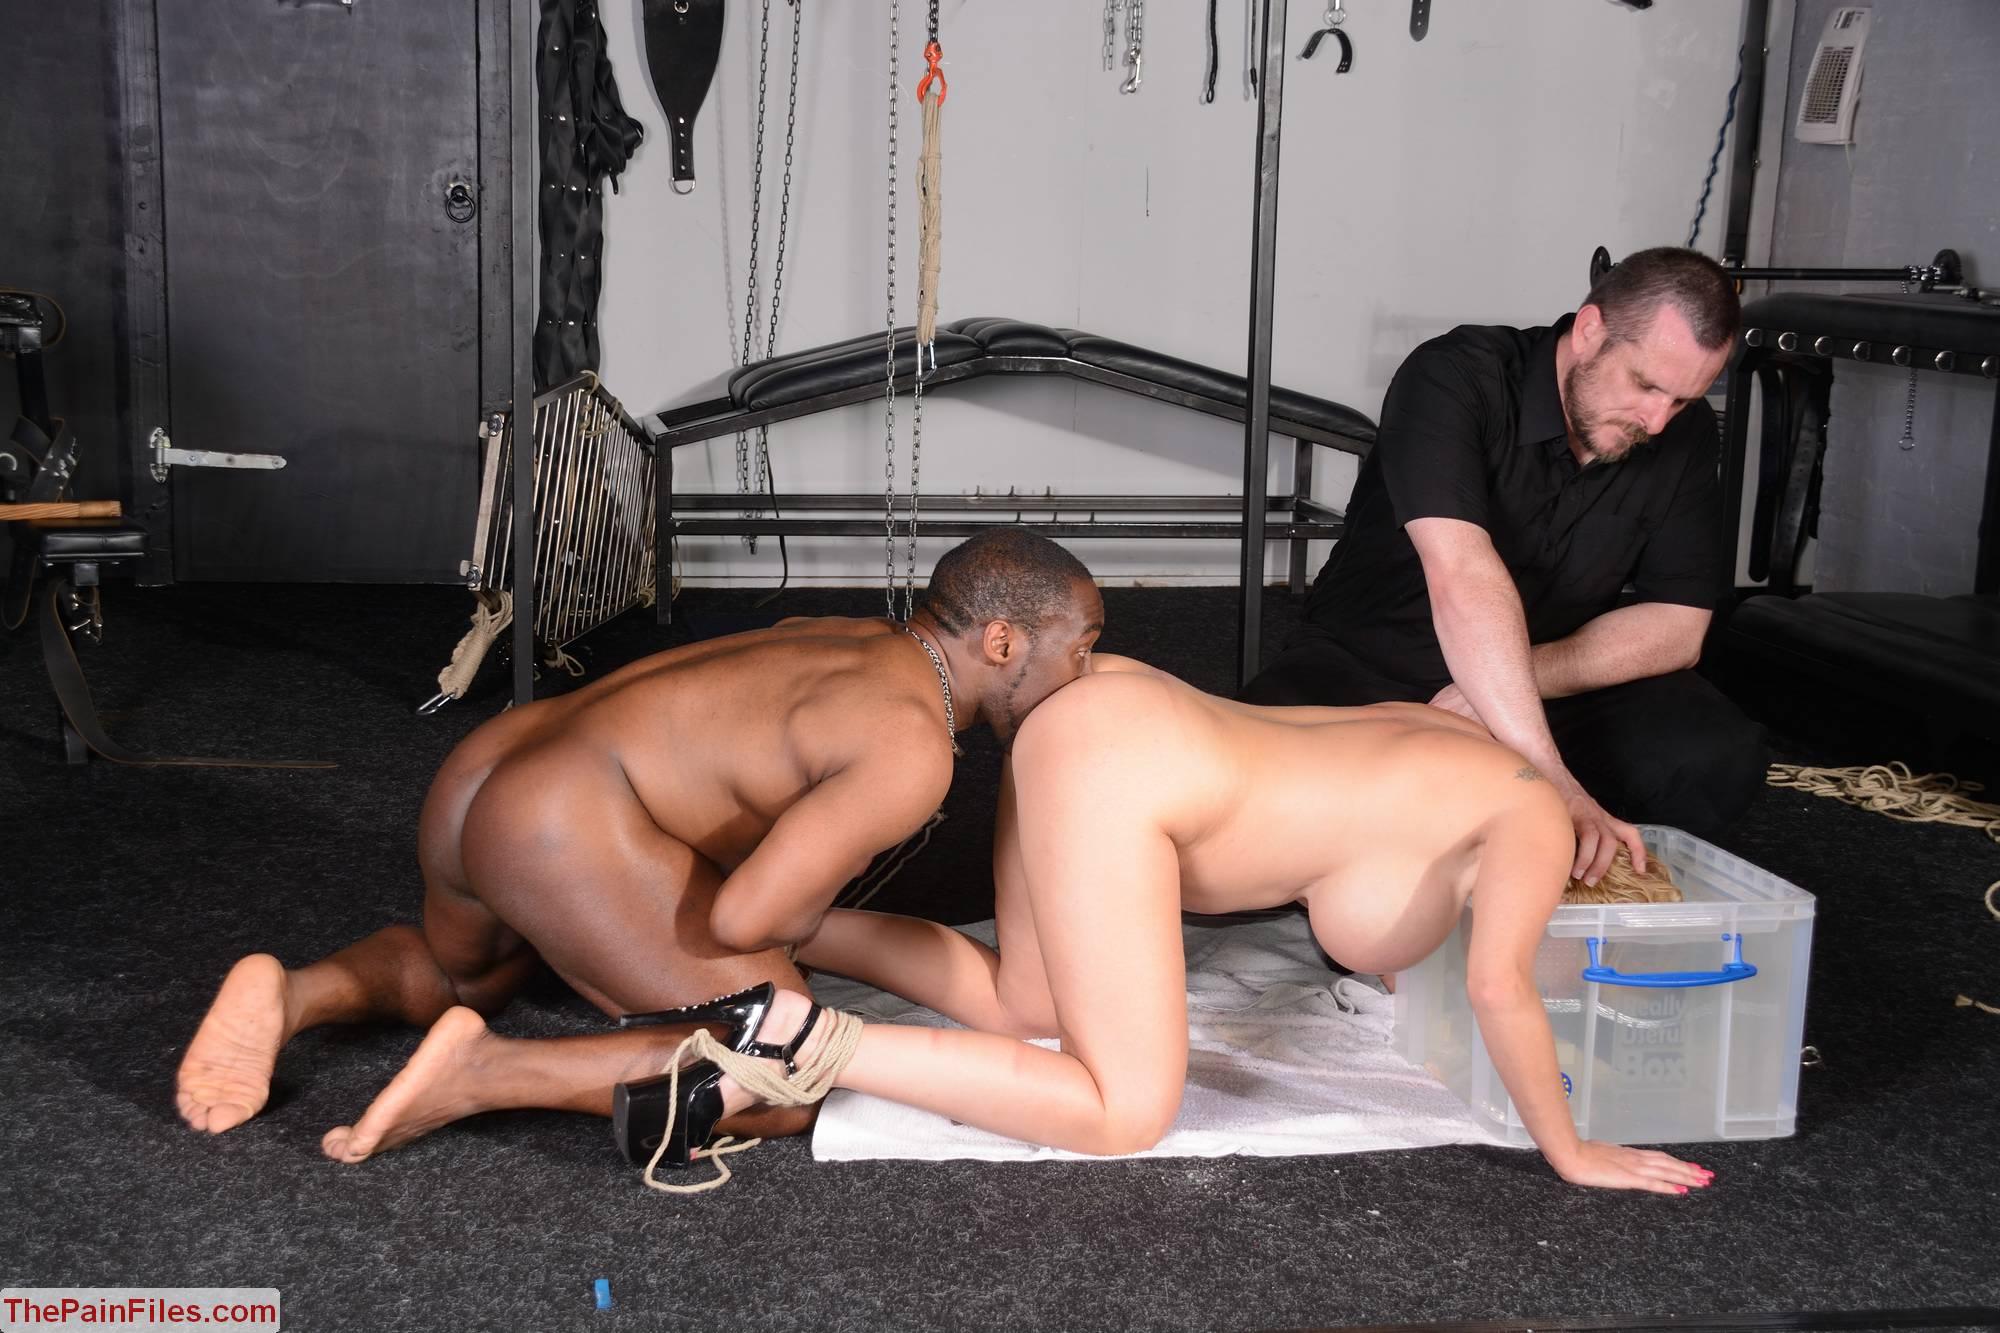 Unique Bondage Interracial Porn